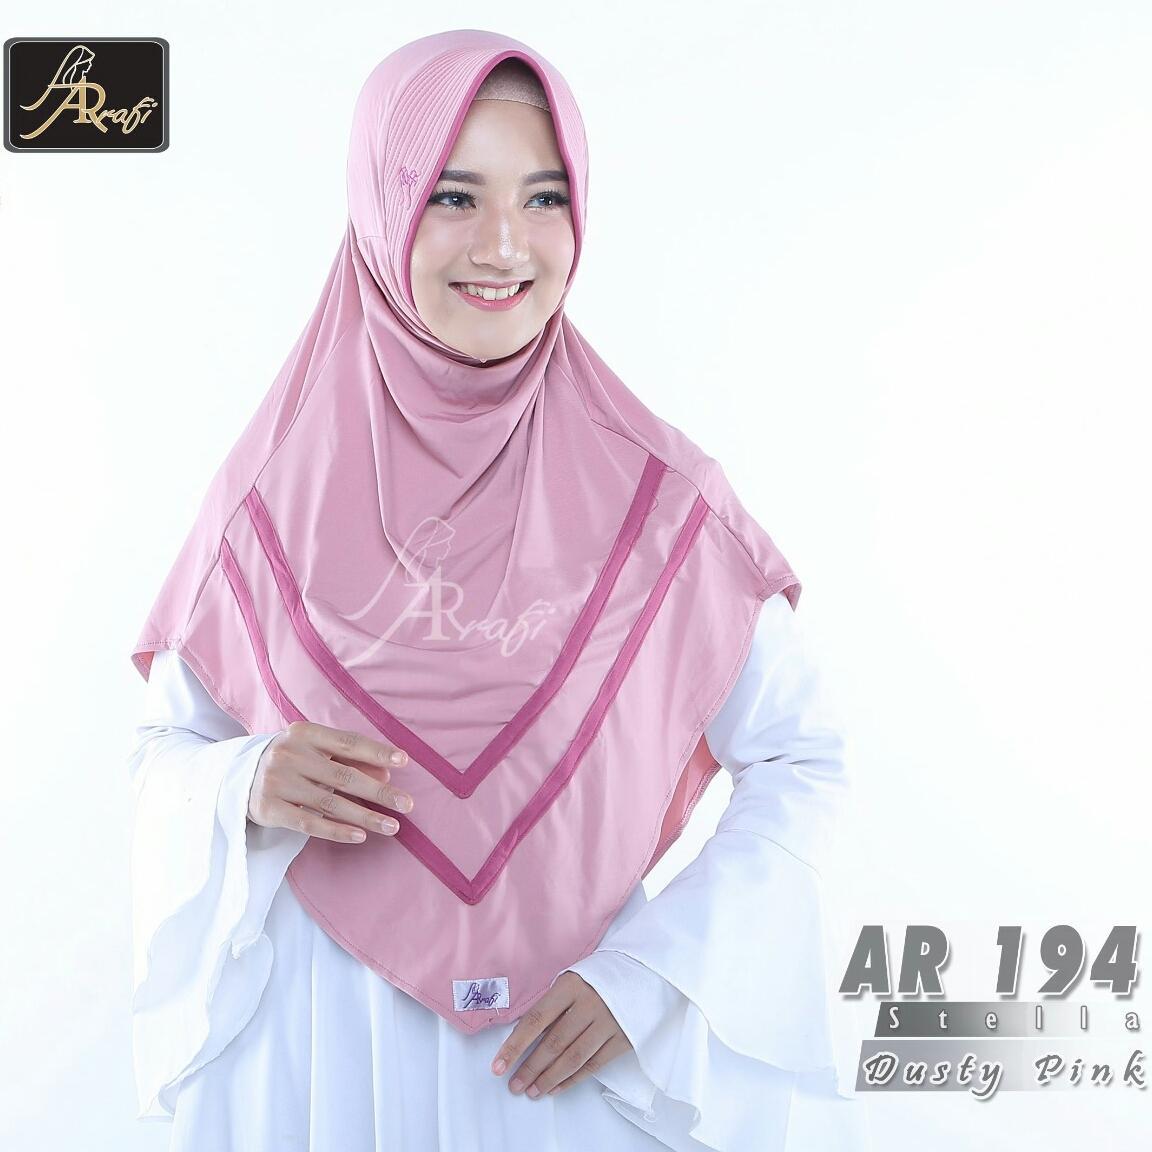 Hijab Instan Arrafi Veena Warna Med Pink Ar71n Kerudung Jilbab Bergo Talita Kombinasi Violet Ar45a Best Seller From Brand Detail Gambar Veera Ori By Ar 194 Dusty